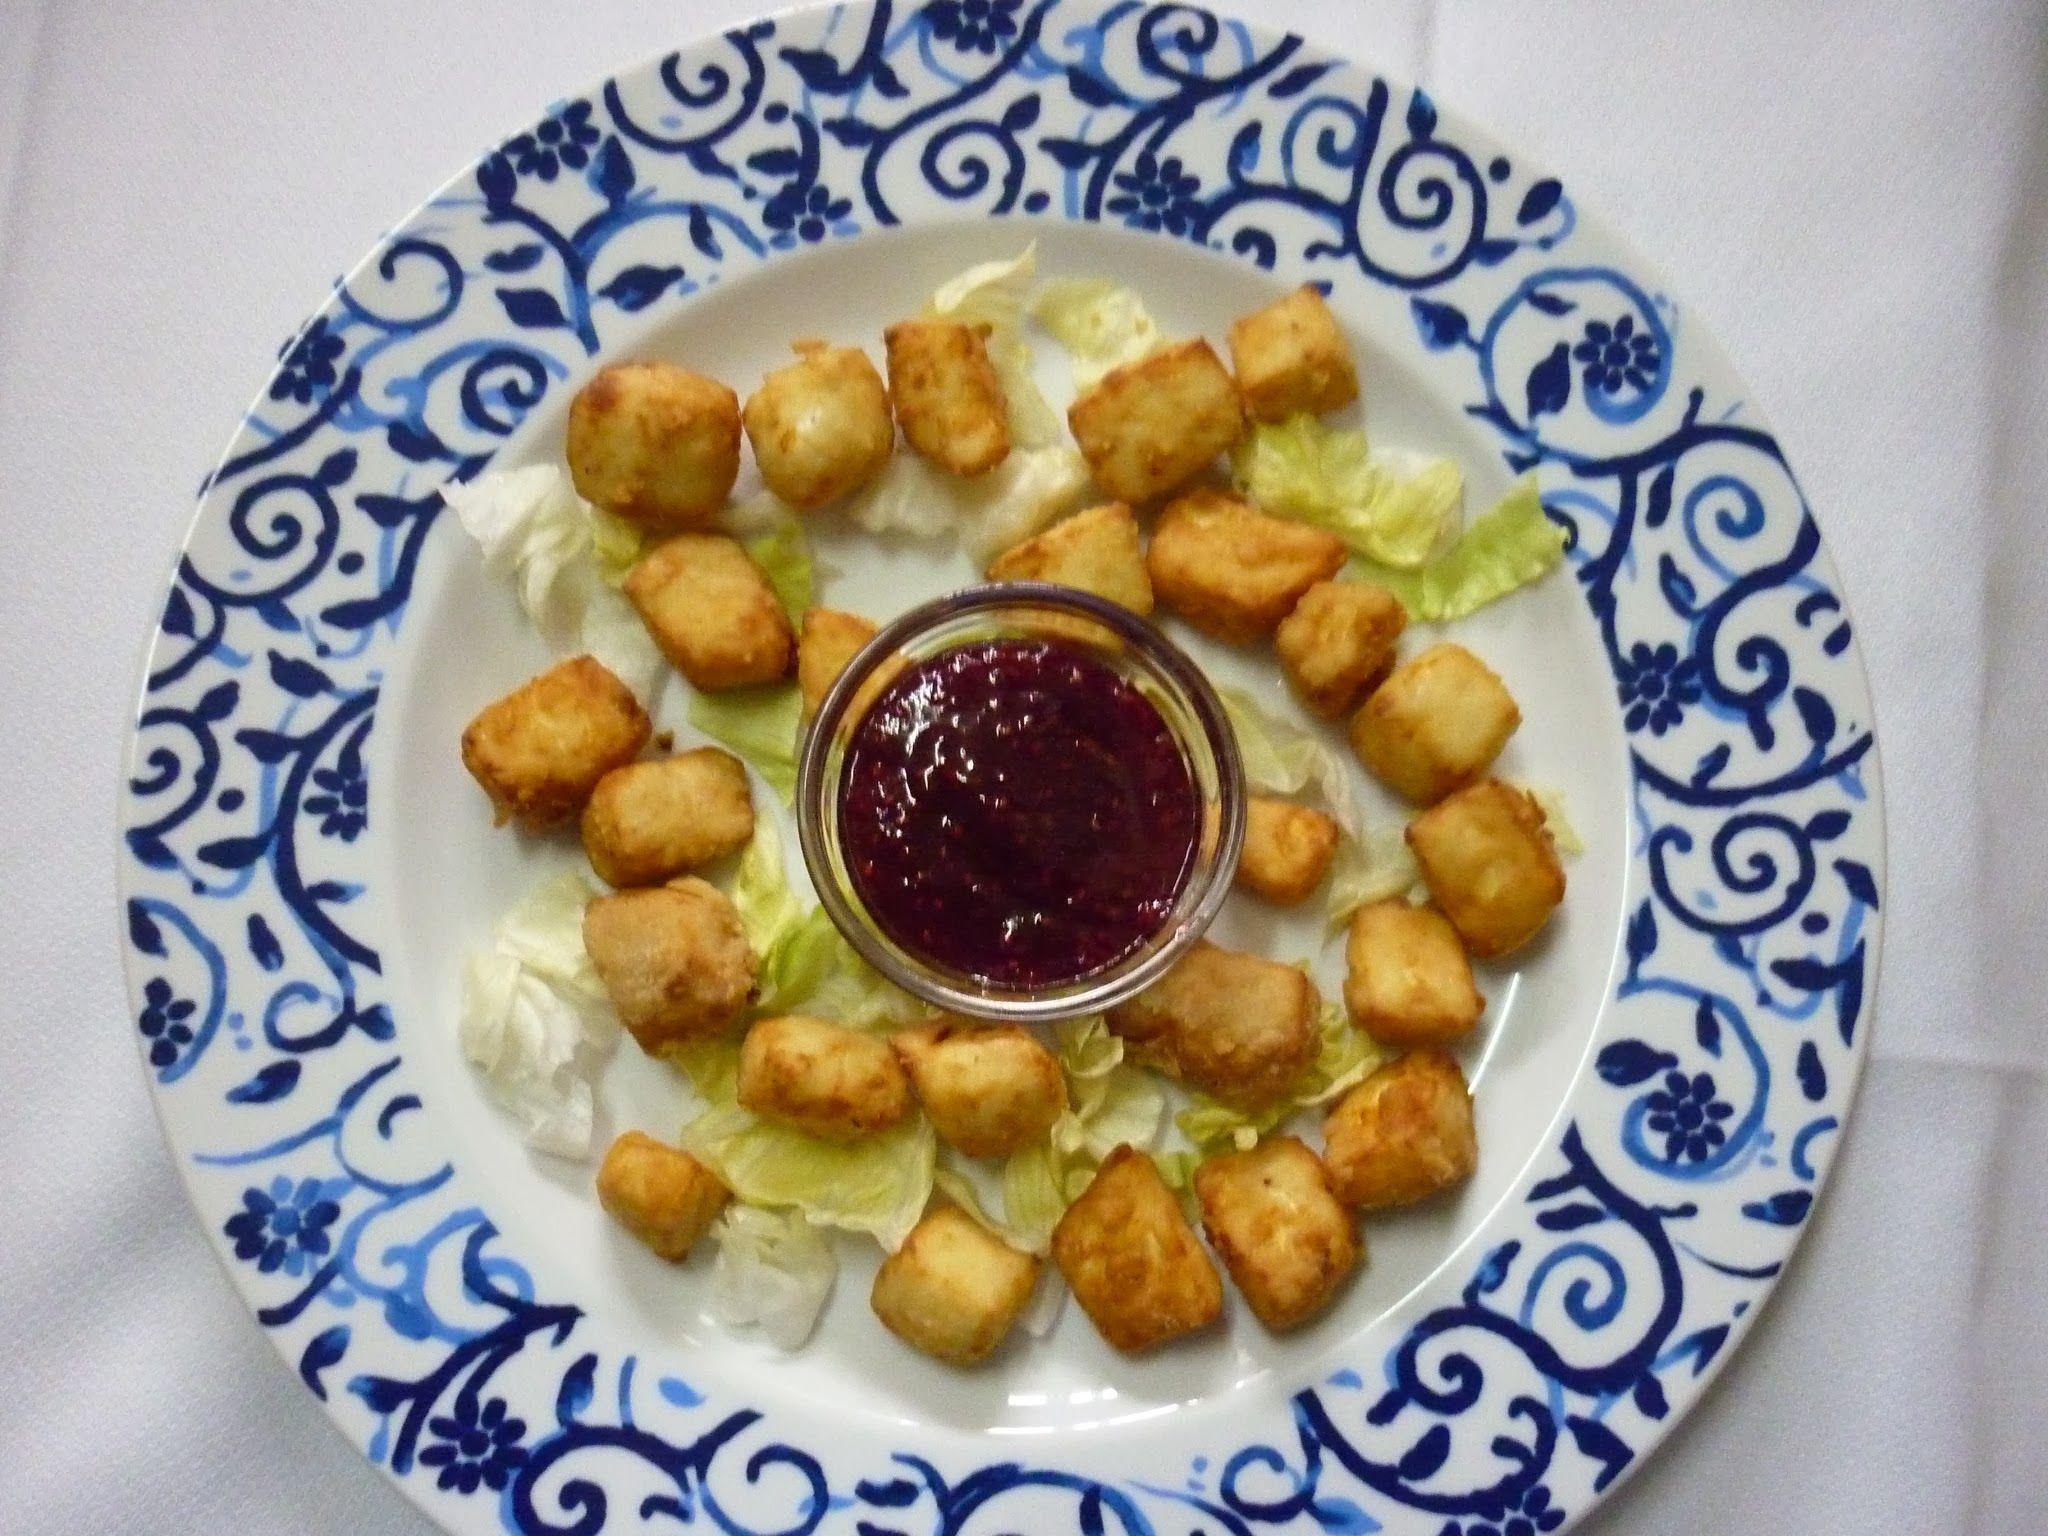 Foto 6 de Mesón - restaurante en Benimantell | Mesón Ca Rafel